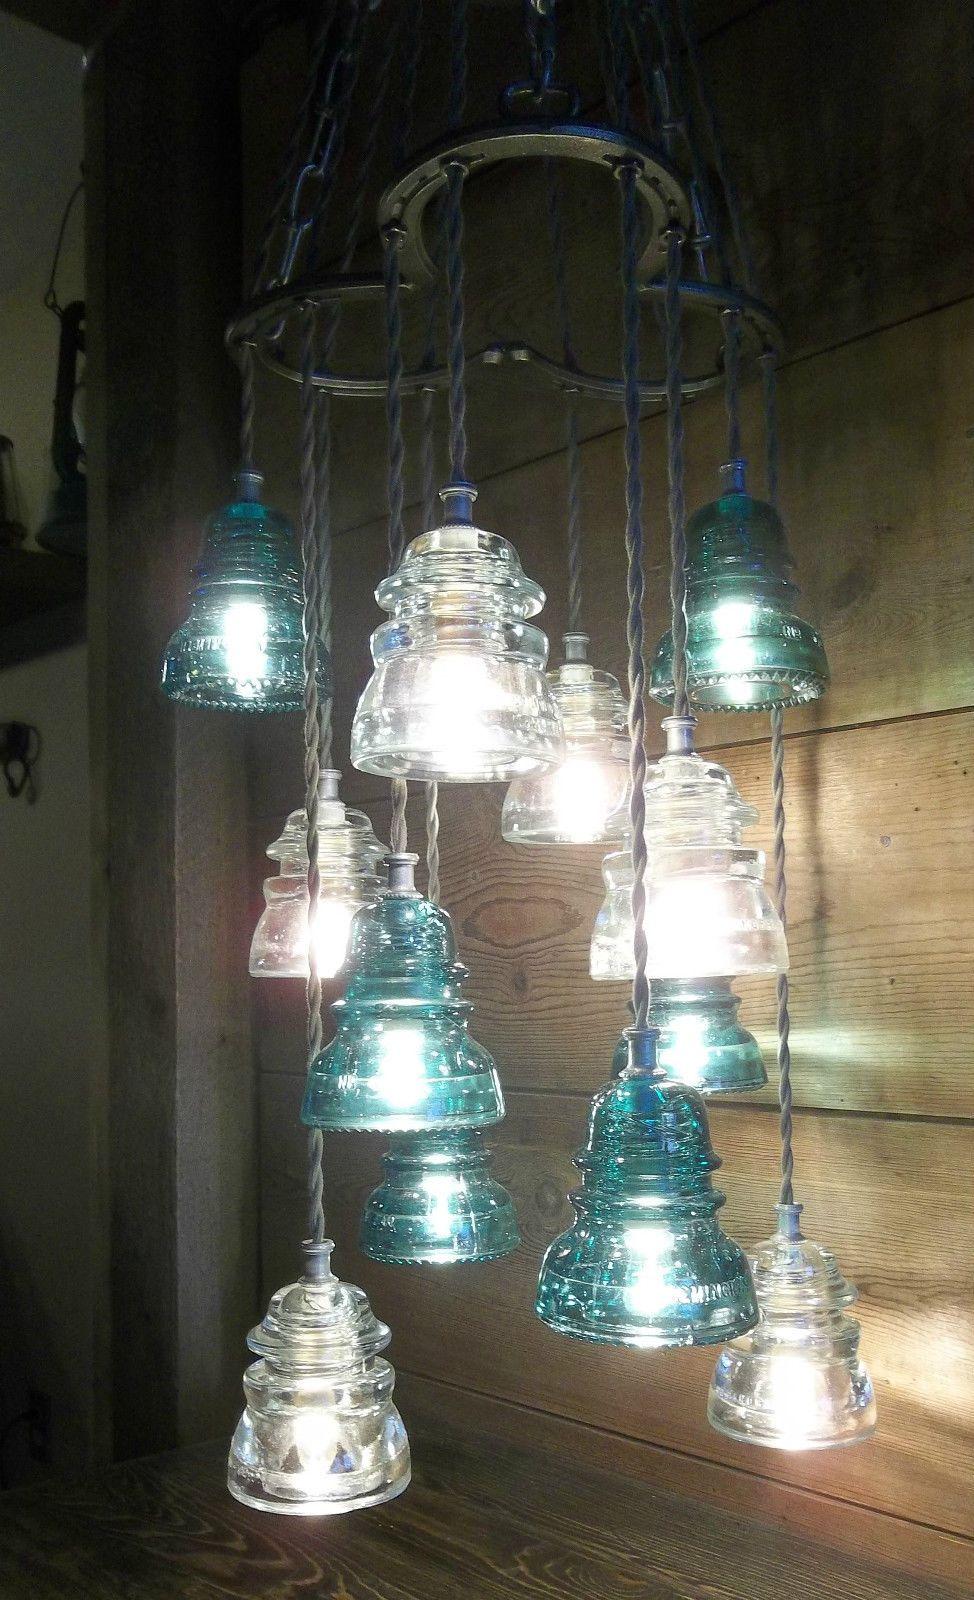 Horse shoe antique glass insulator pendant chandelierlight fixture horse shoe antique glass insulator pendant chandelier light fixture glass art ebay arubaitofo Choice Image